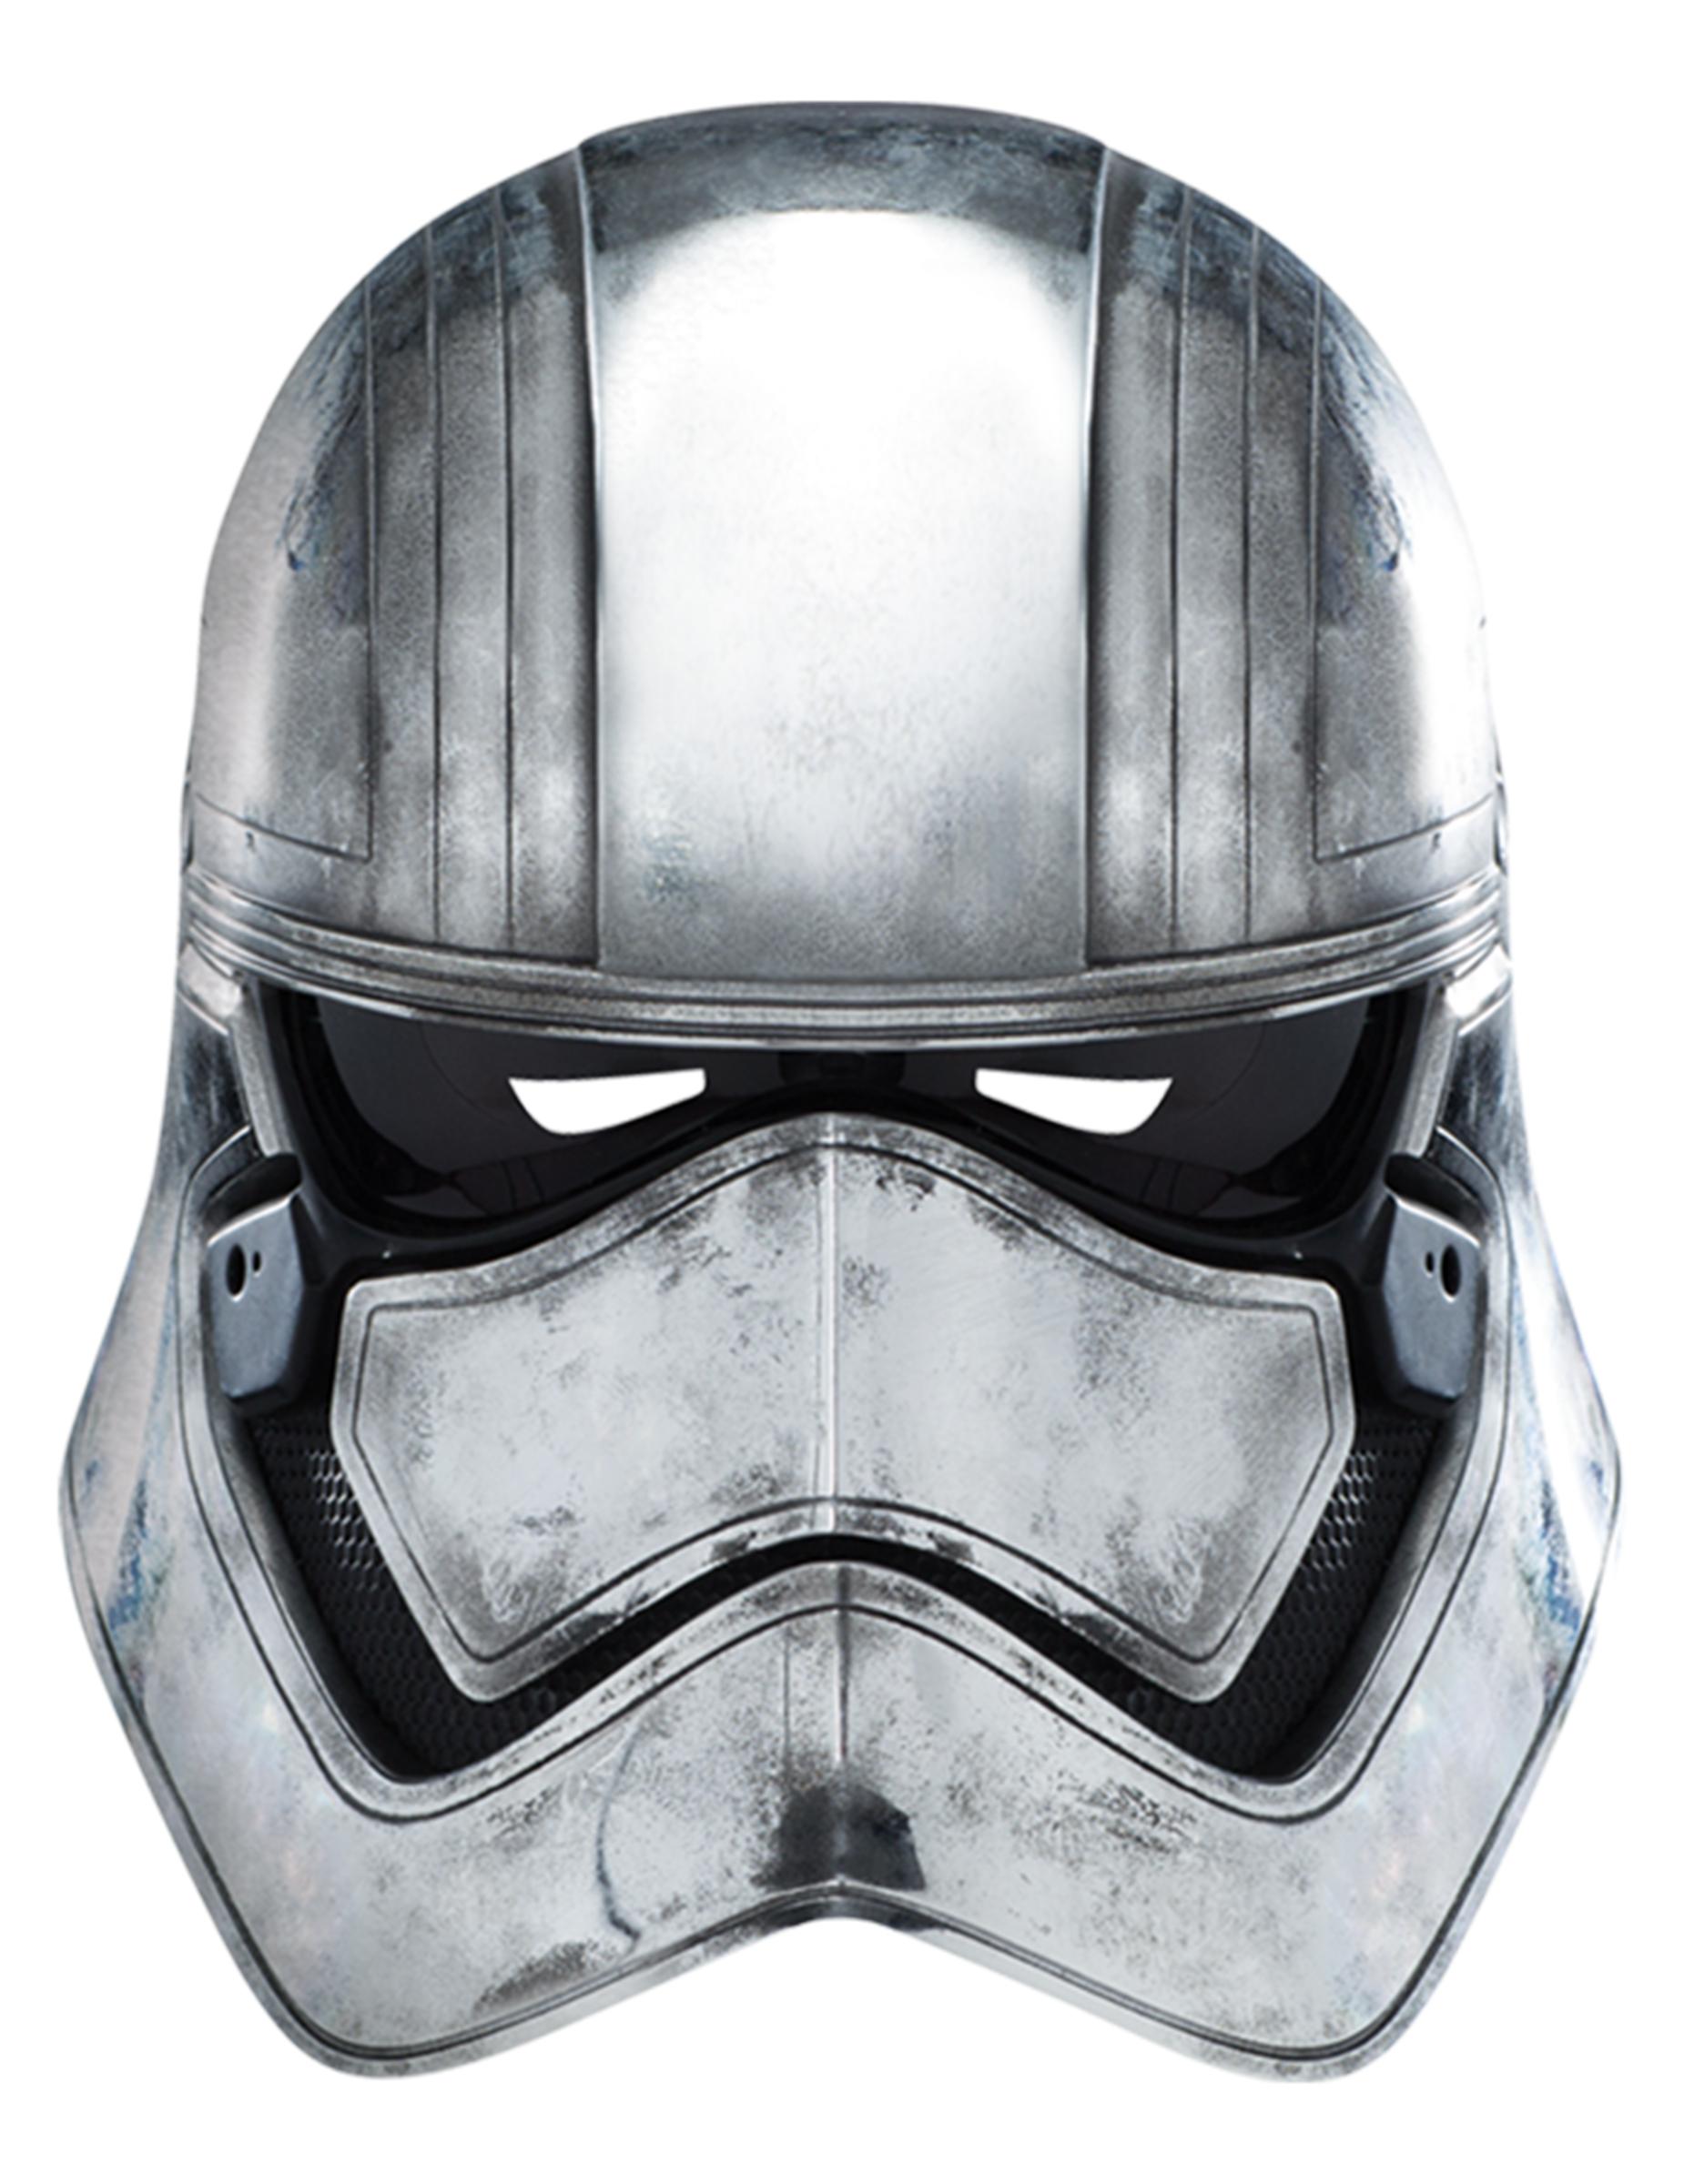 Star Wars Le R/éveil de la Force 8 Masque de f/ête en carton